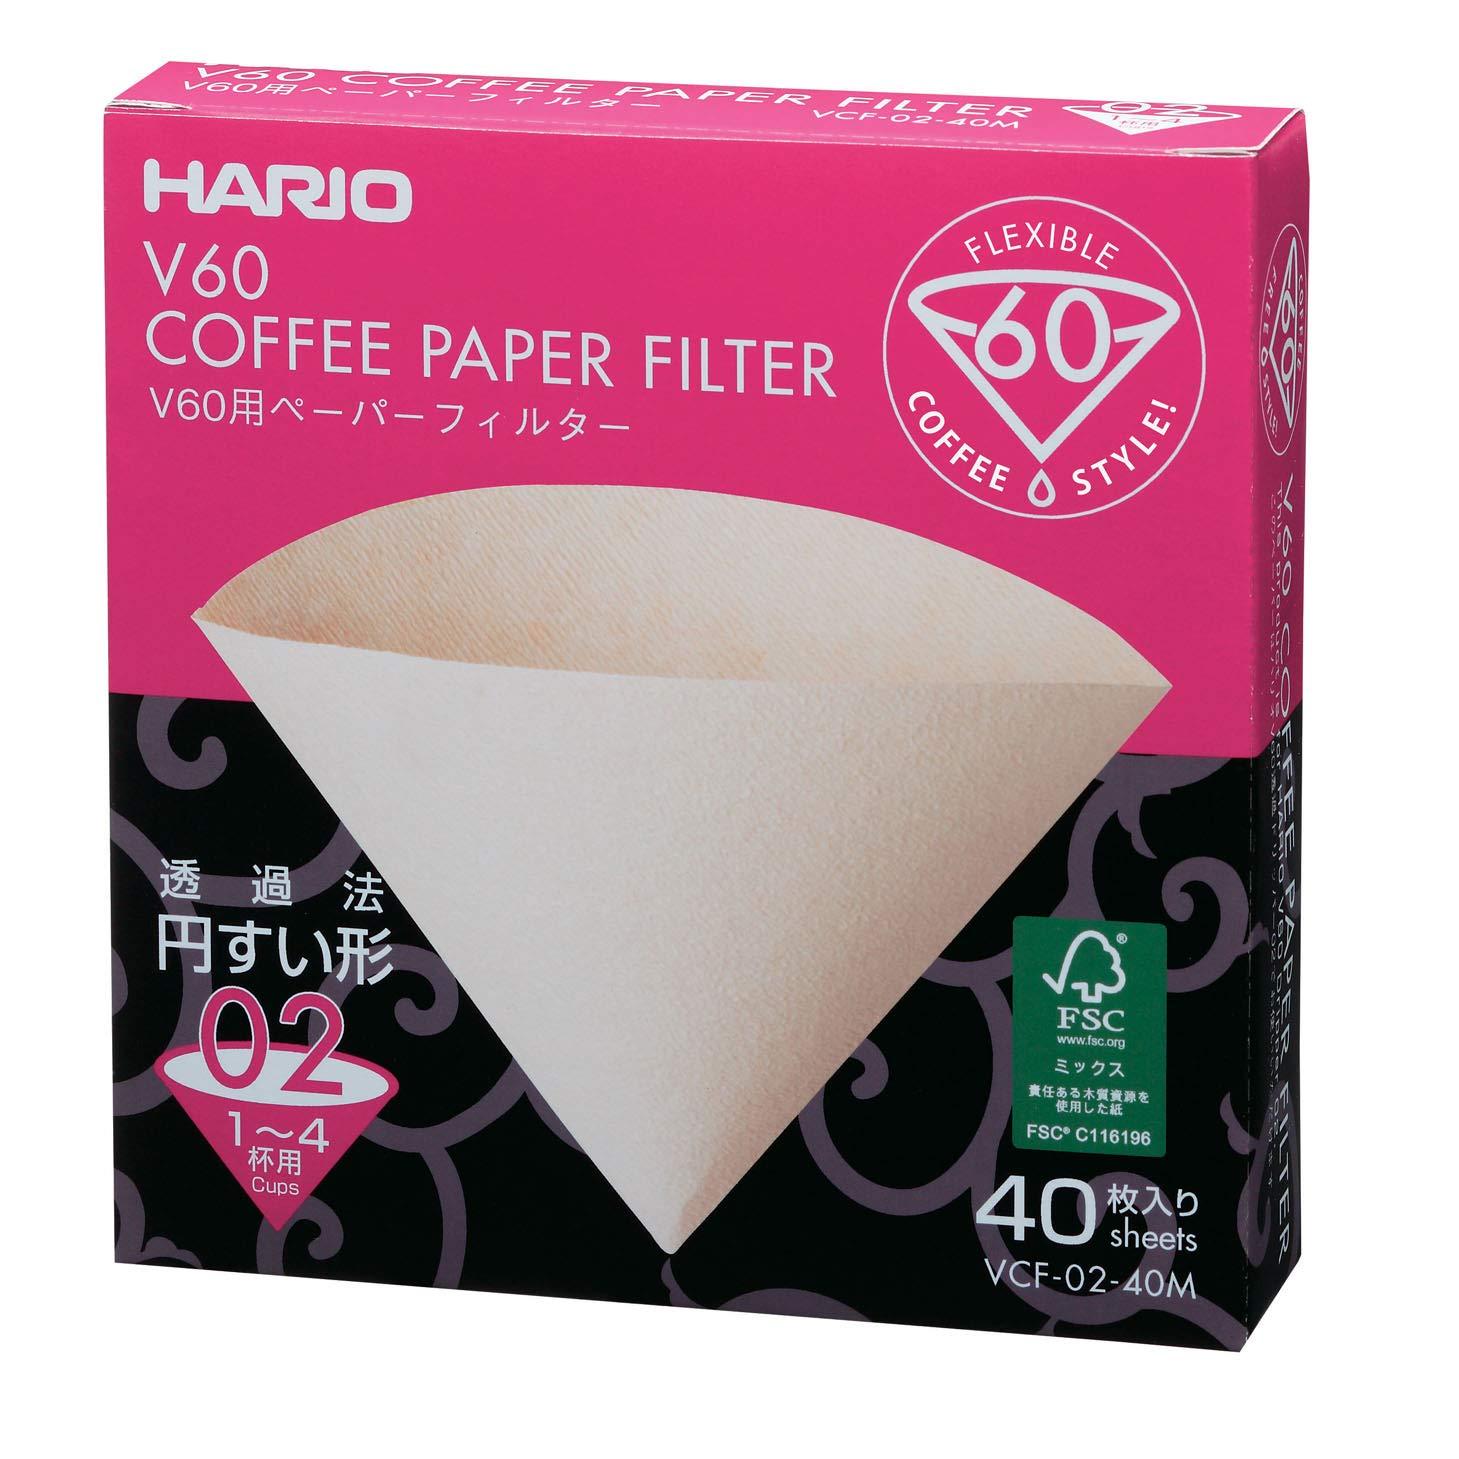 V60 Filtro de papel natural 02 - 40 Und